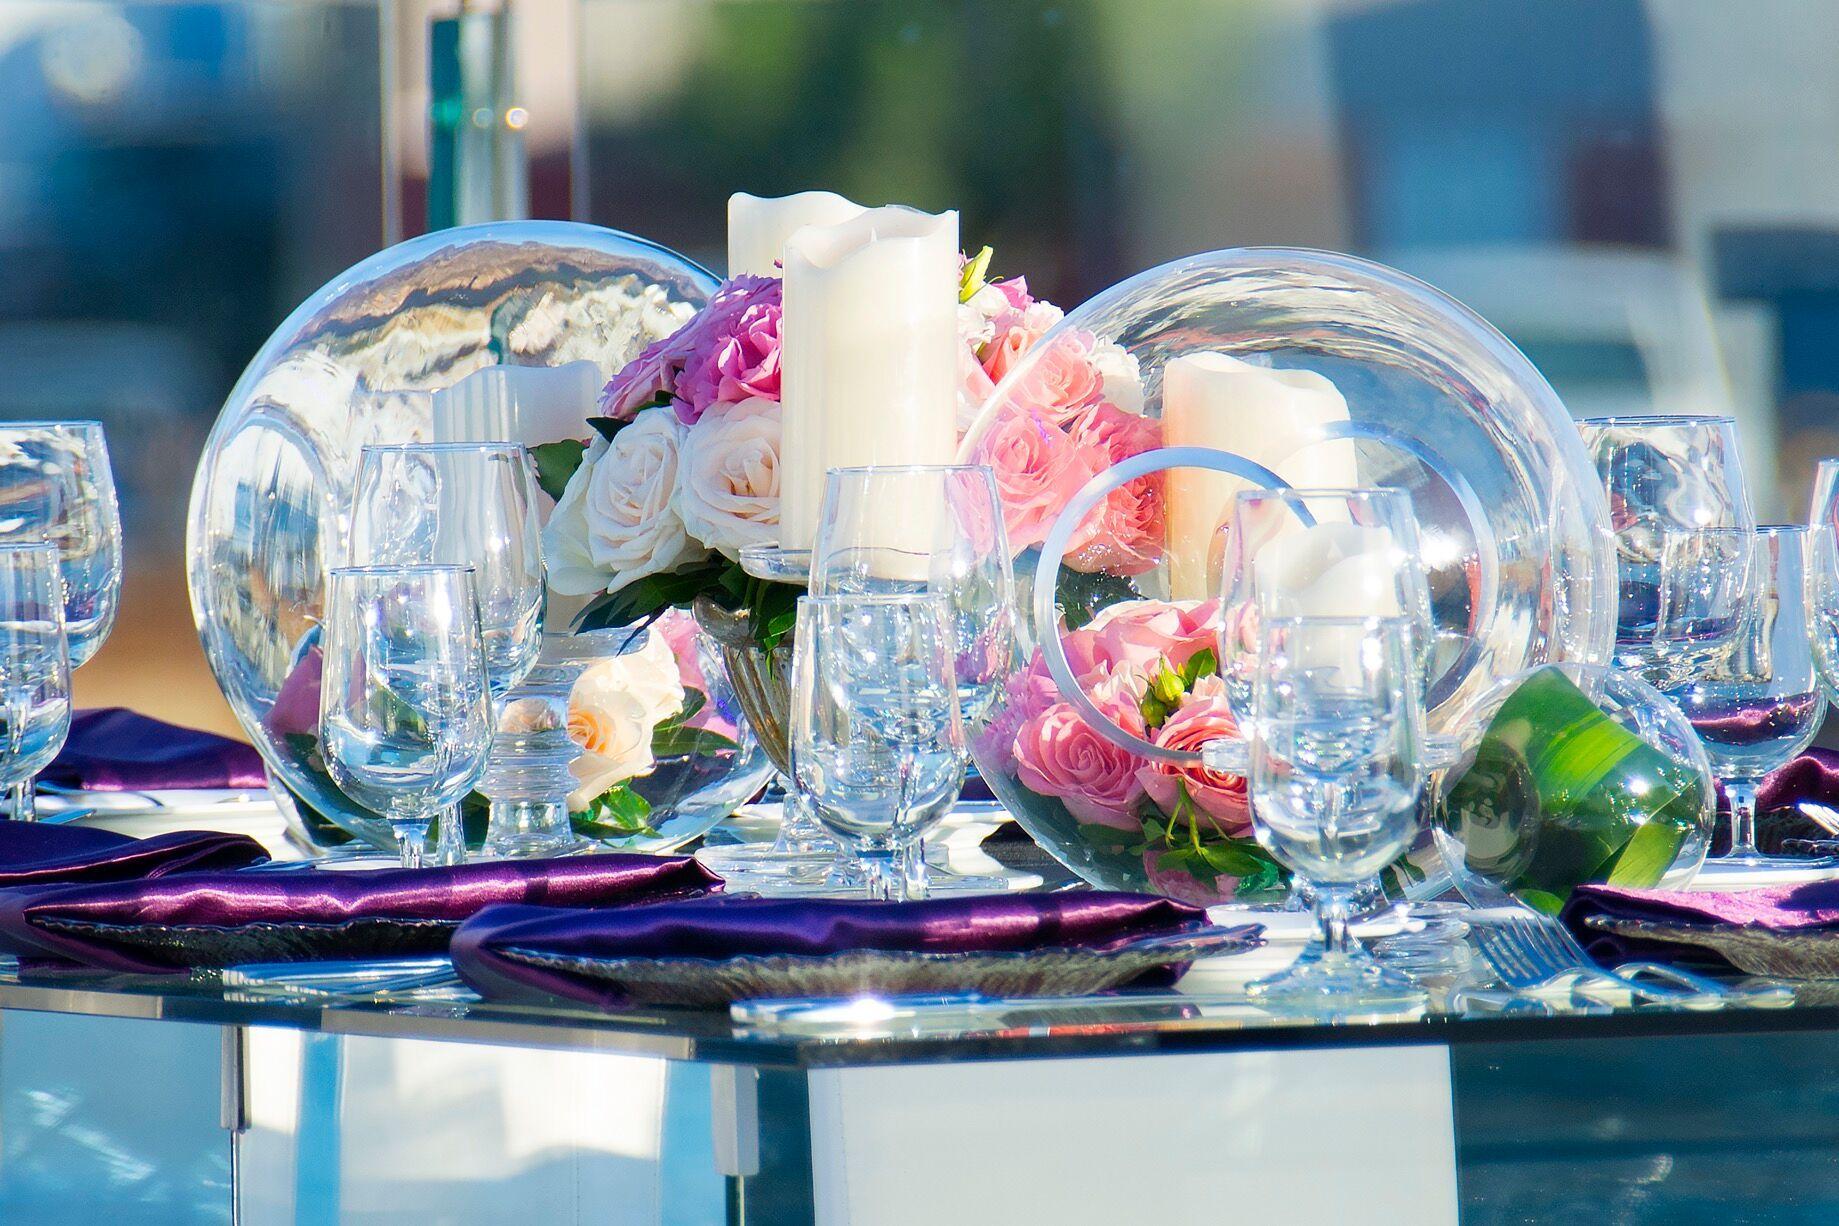 Modern wedding decor images  Modern wedding decor delcaboeventdesign breathlessresort